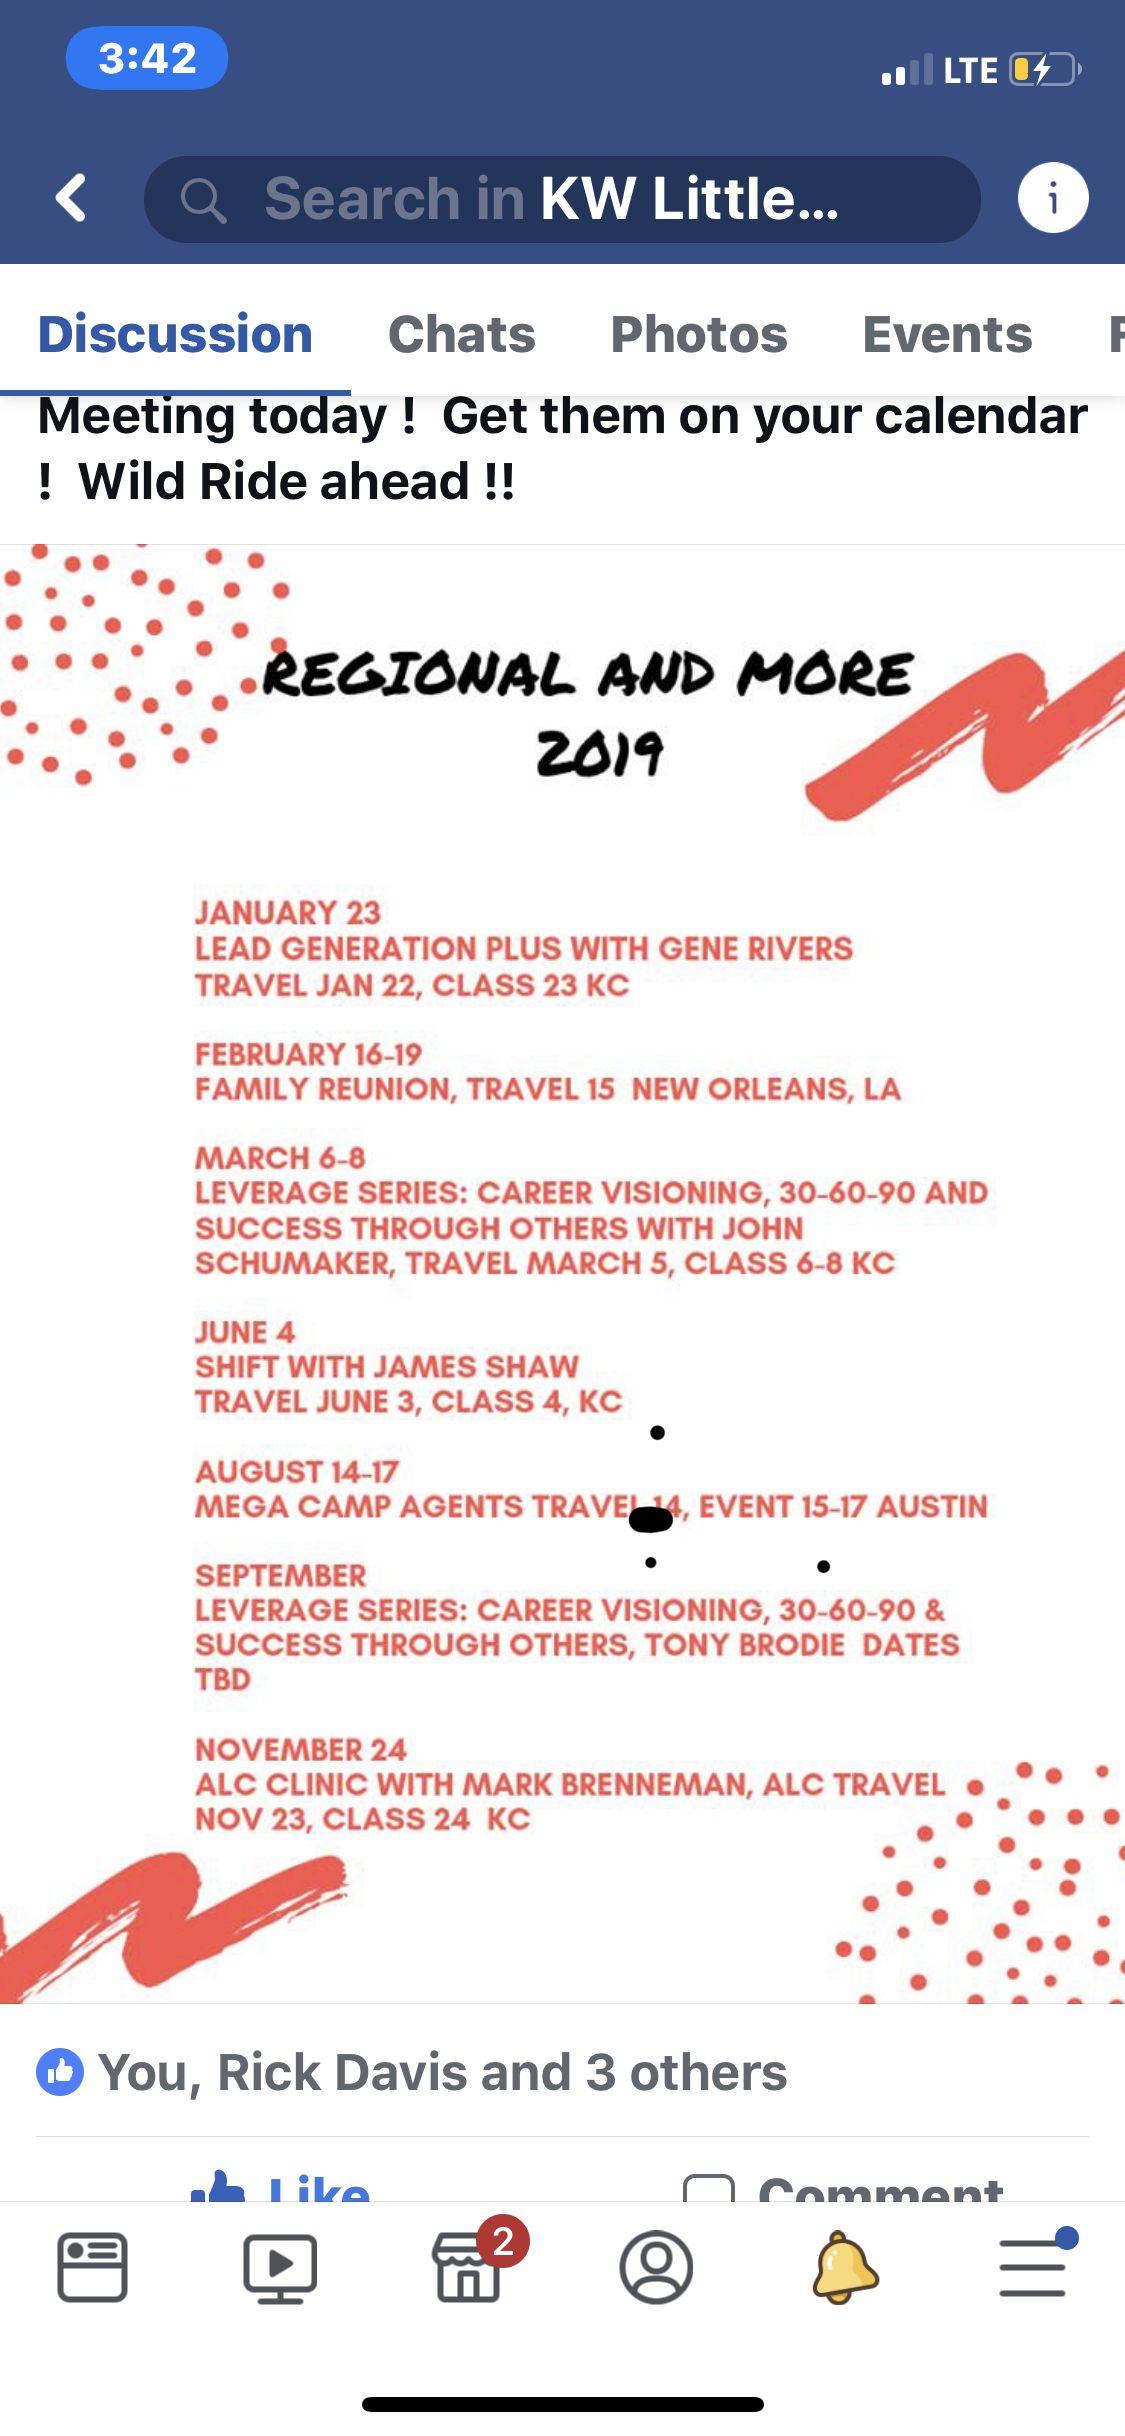 Pincosy Burke On Real Estate Little Rock, Ar | Family For Little Rock January Event Calendar